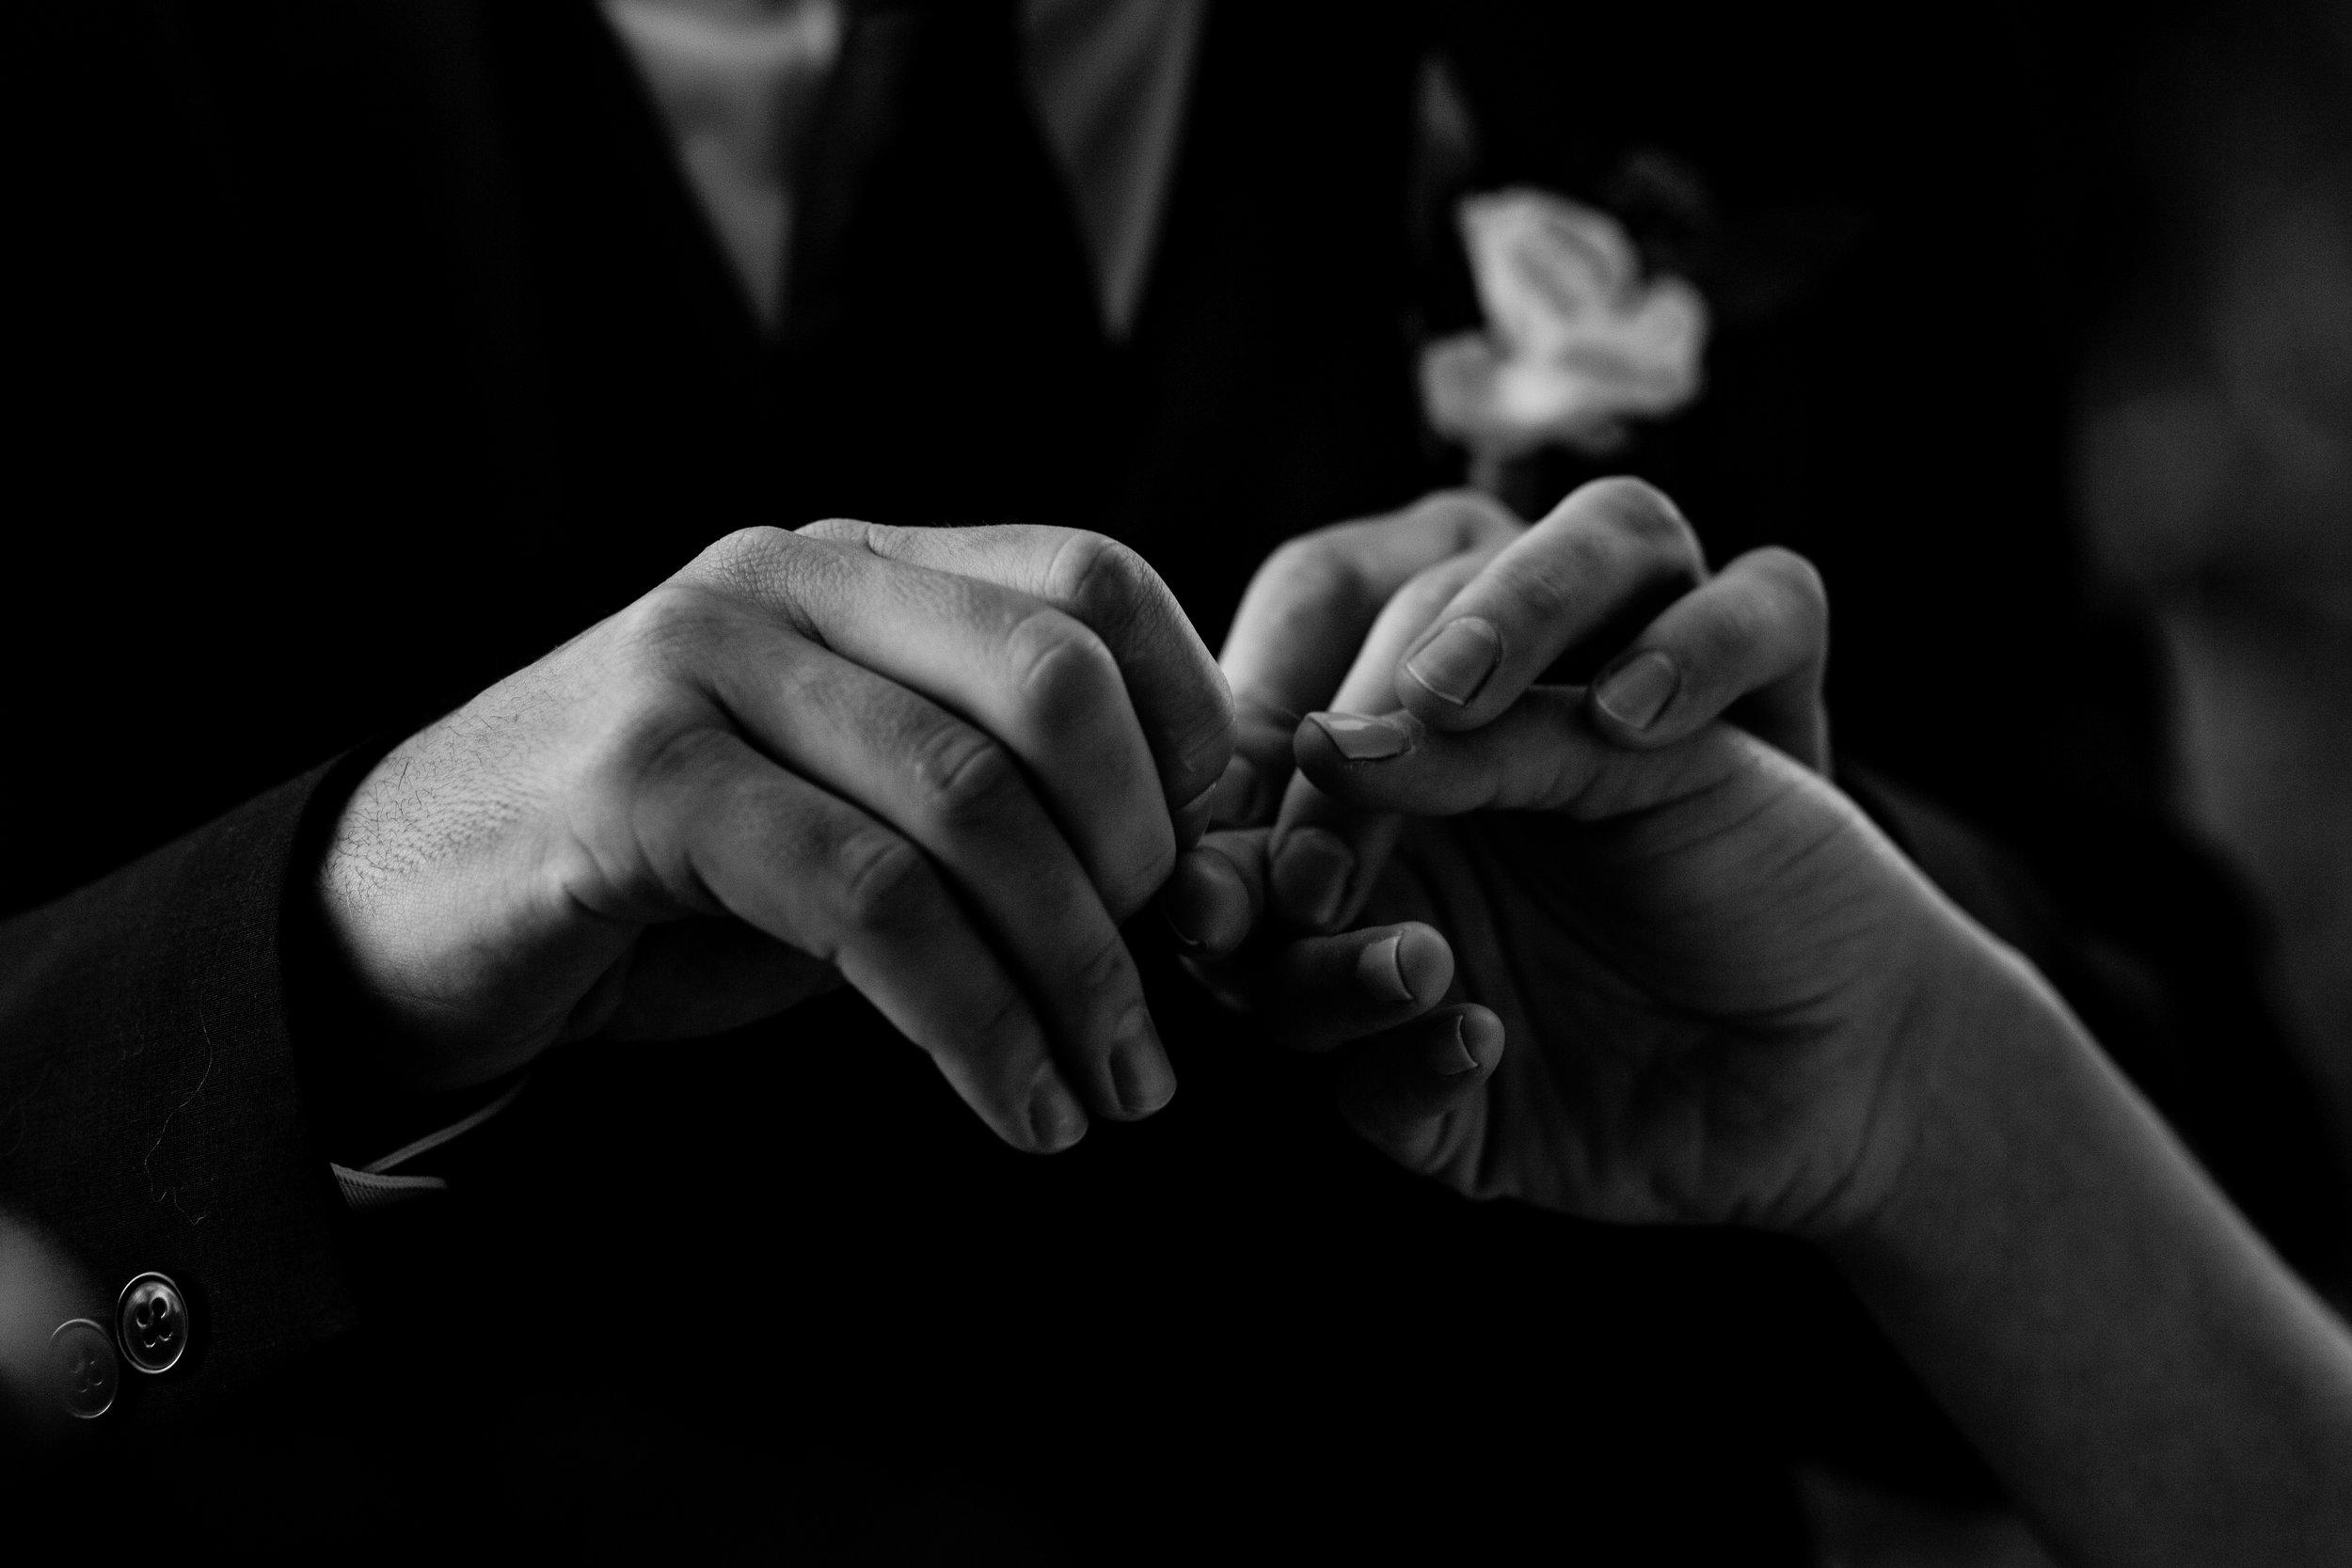 nicole-daacke-photography-sedona-arizona-destination-elopement-wedding-photographer-catherdral-rock-hiking-elopement-sedona-river-elopement-photos-desert-rock-wedding-photographer-laid-back-spontaneous-elopement-26.jpg